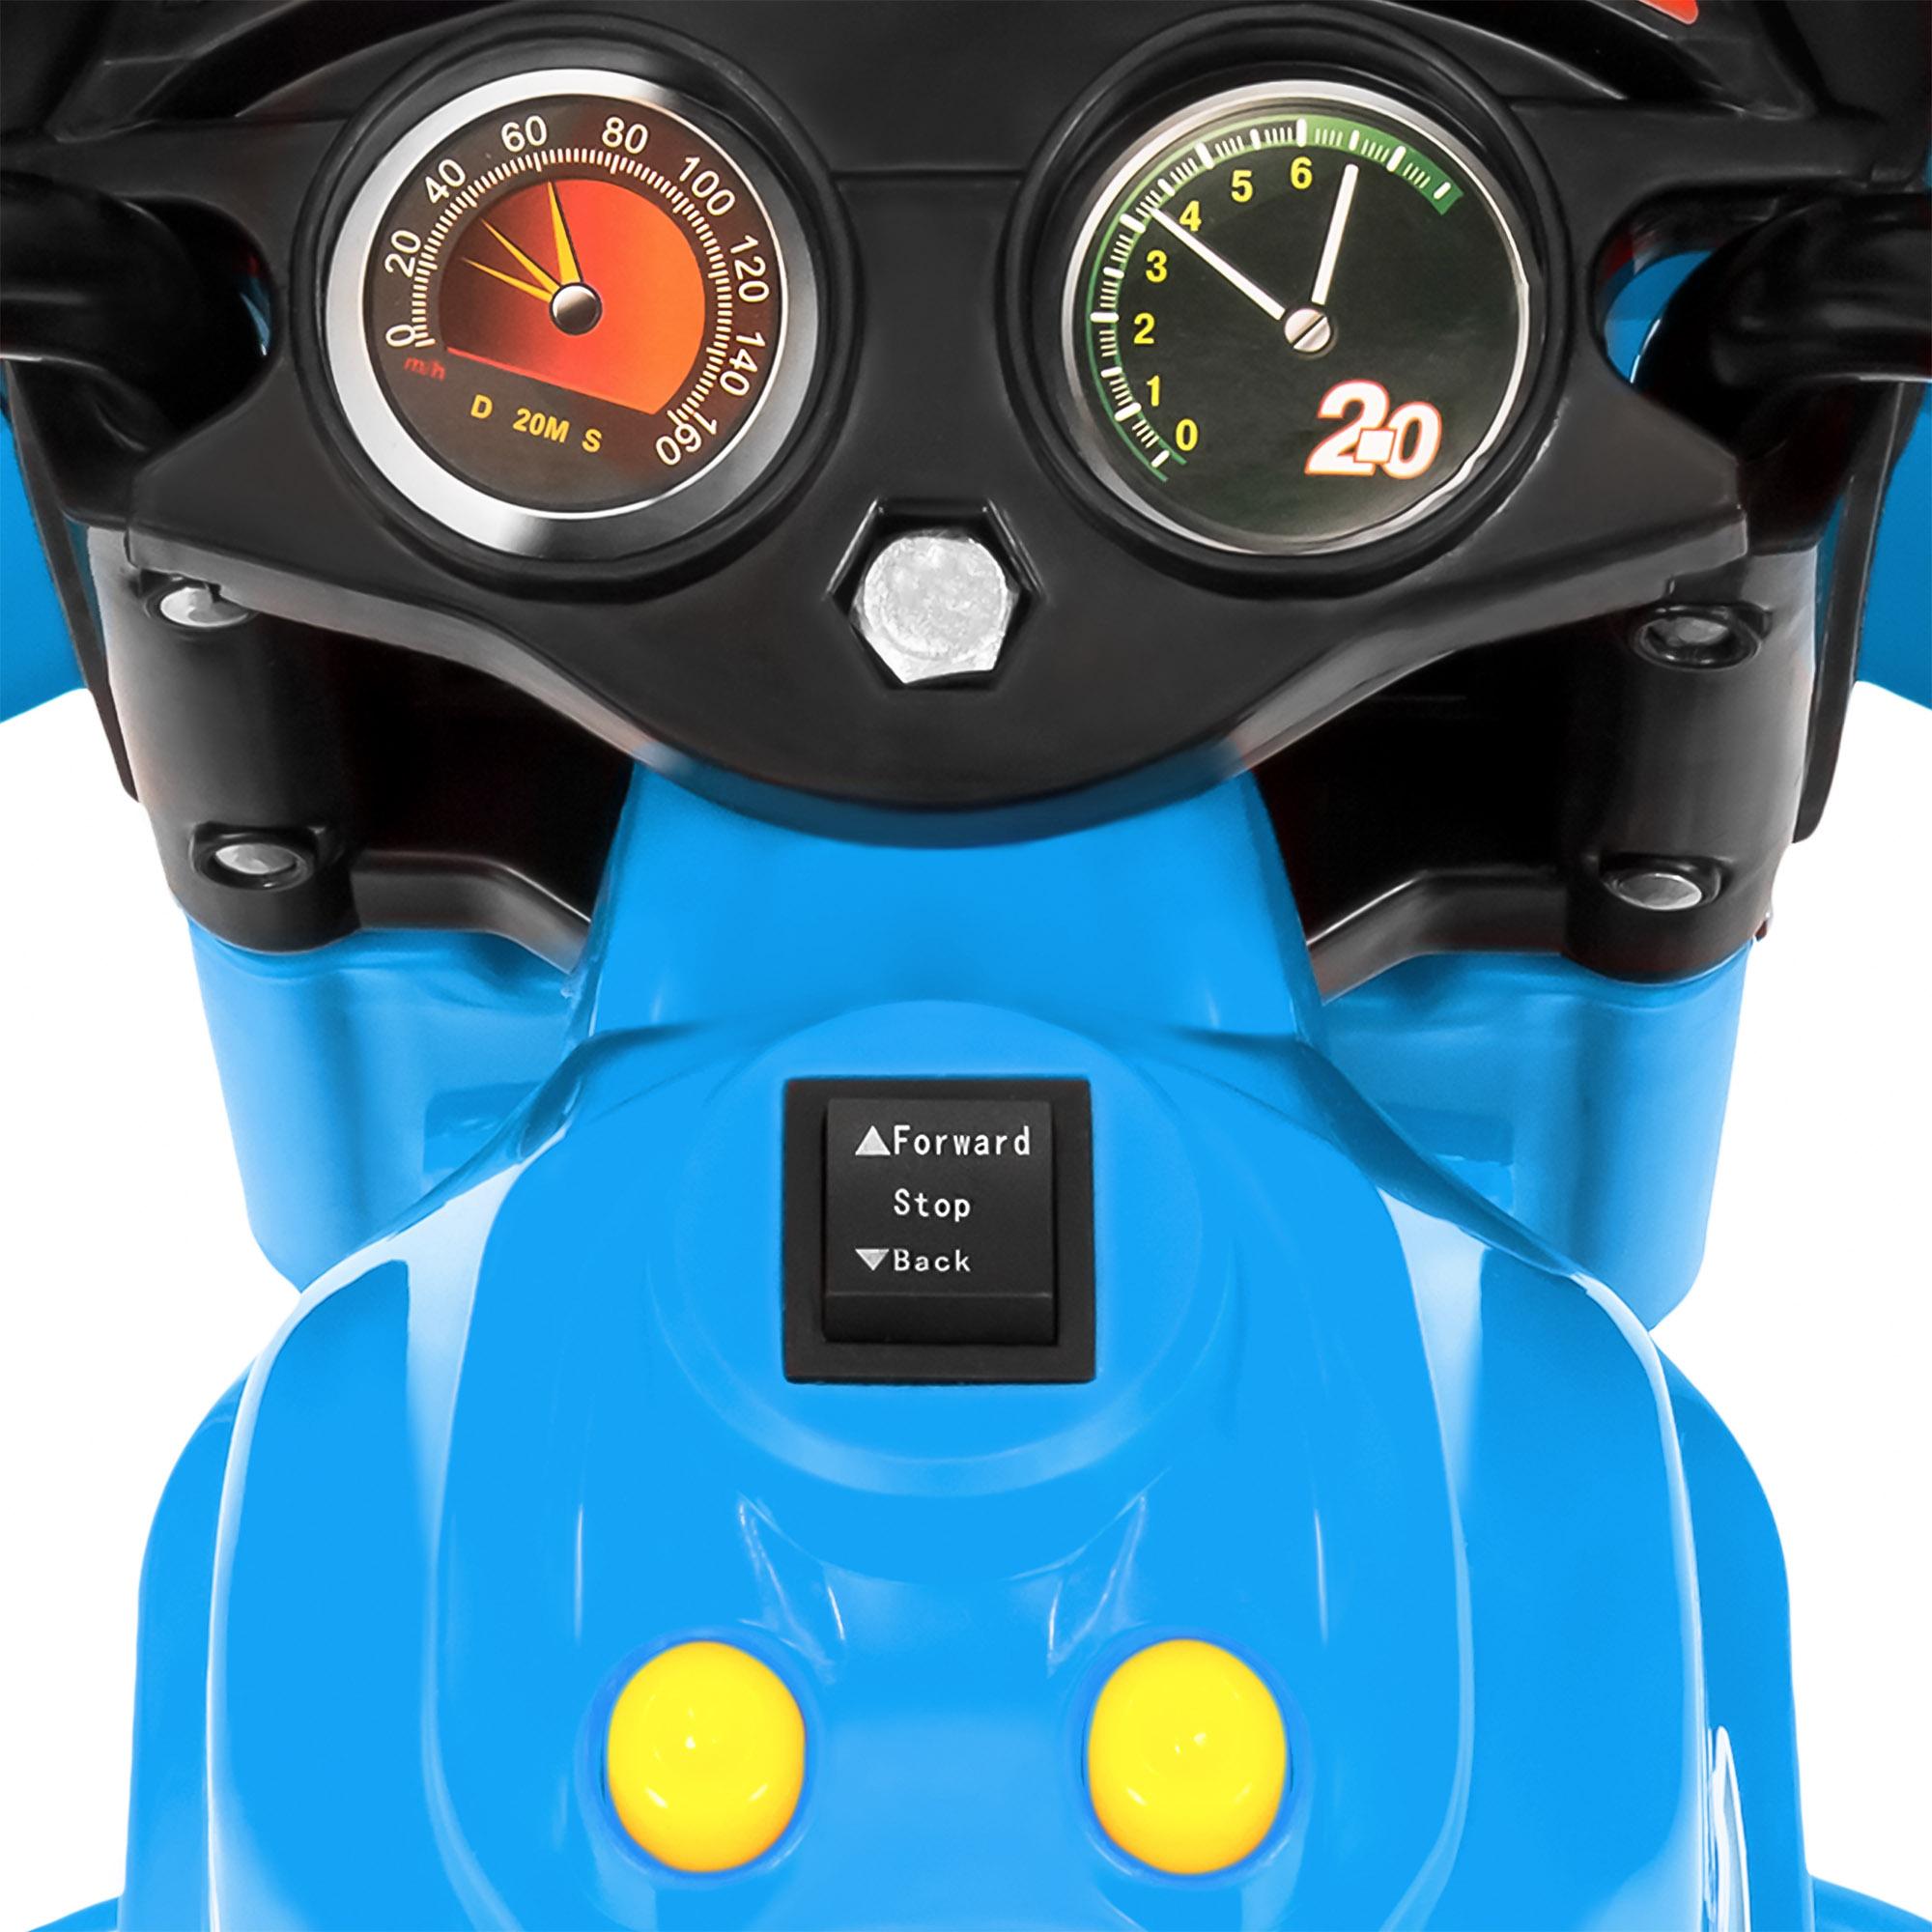 BCP-6V-Kids-3-Wheel-Motorcycle-Ride-On-Toy-w-LED-Lights-Music-Storage thumbnail 18